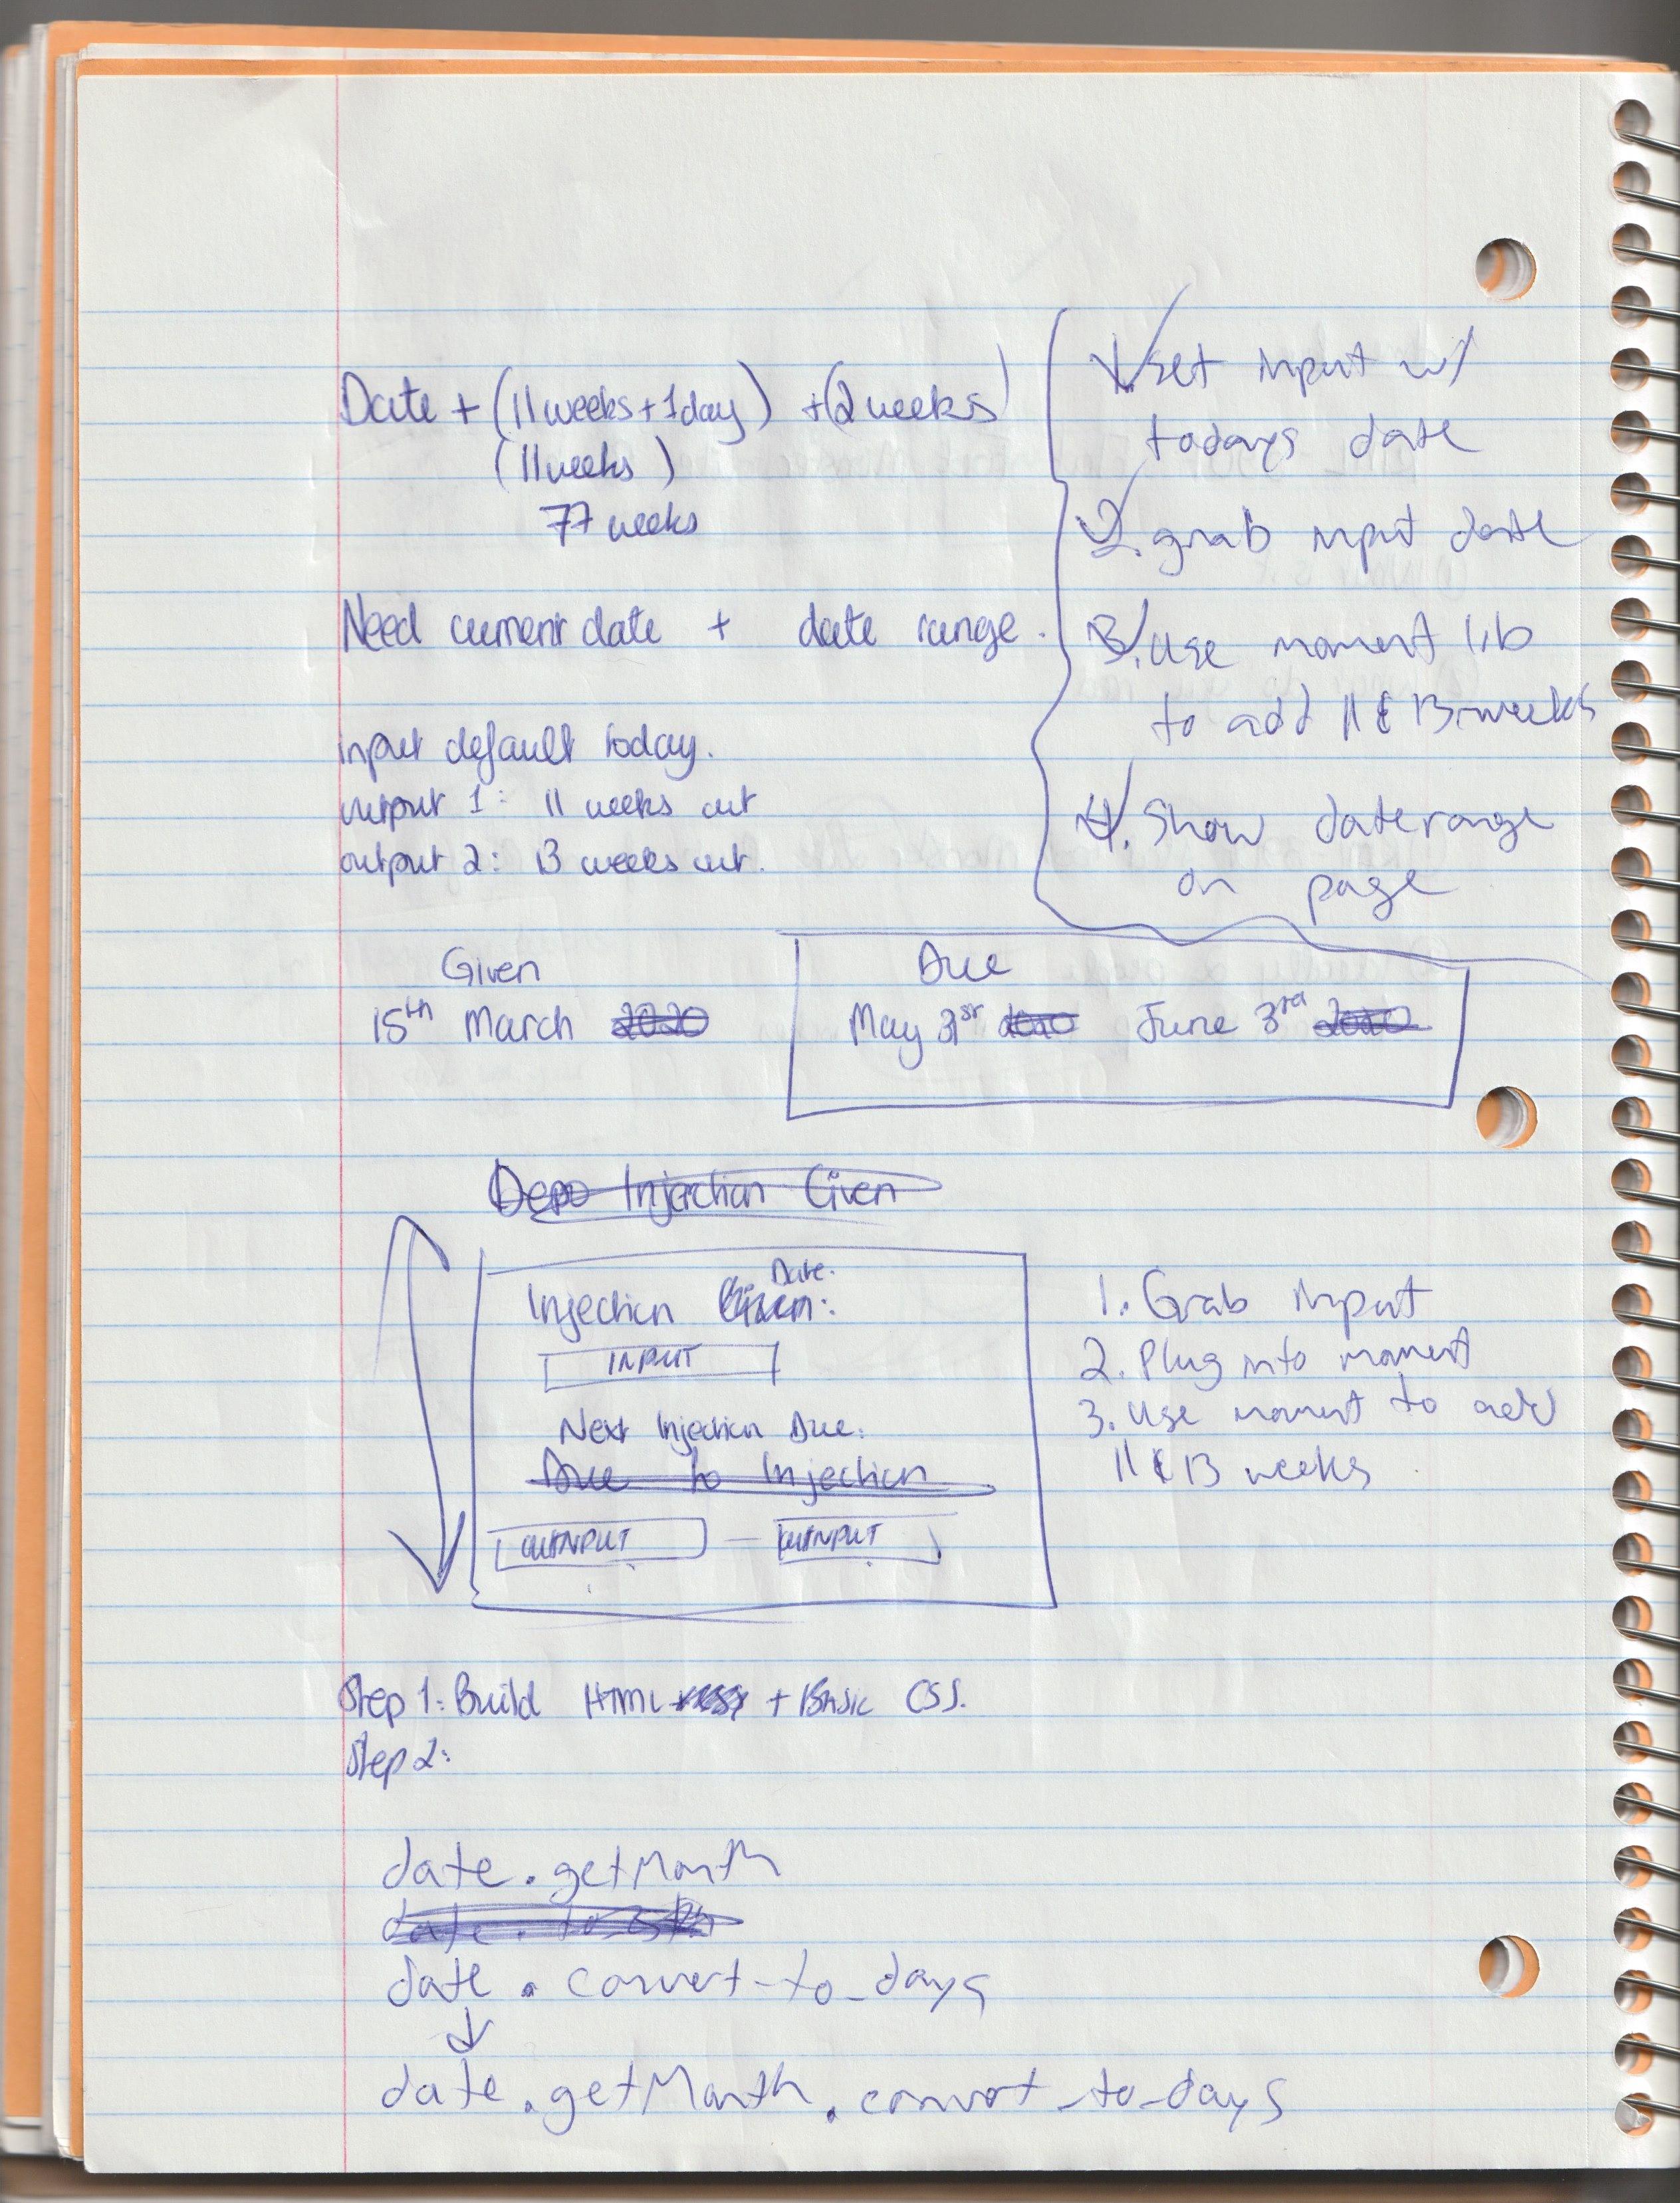 Emdixonroche regarding Depo-Provera Calculator